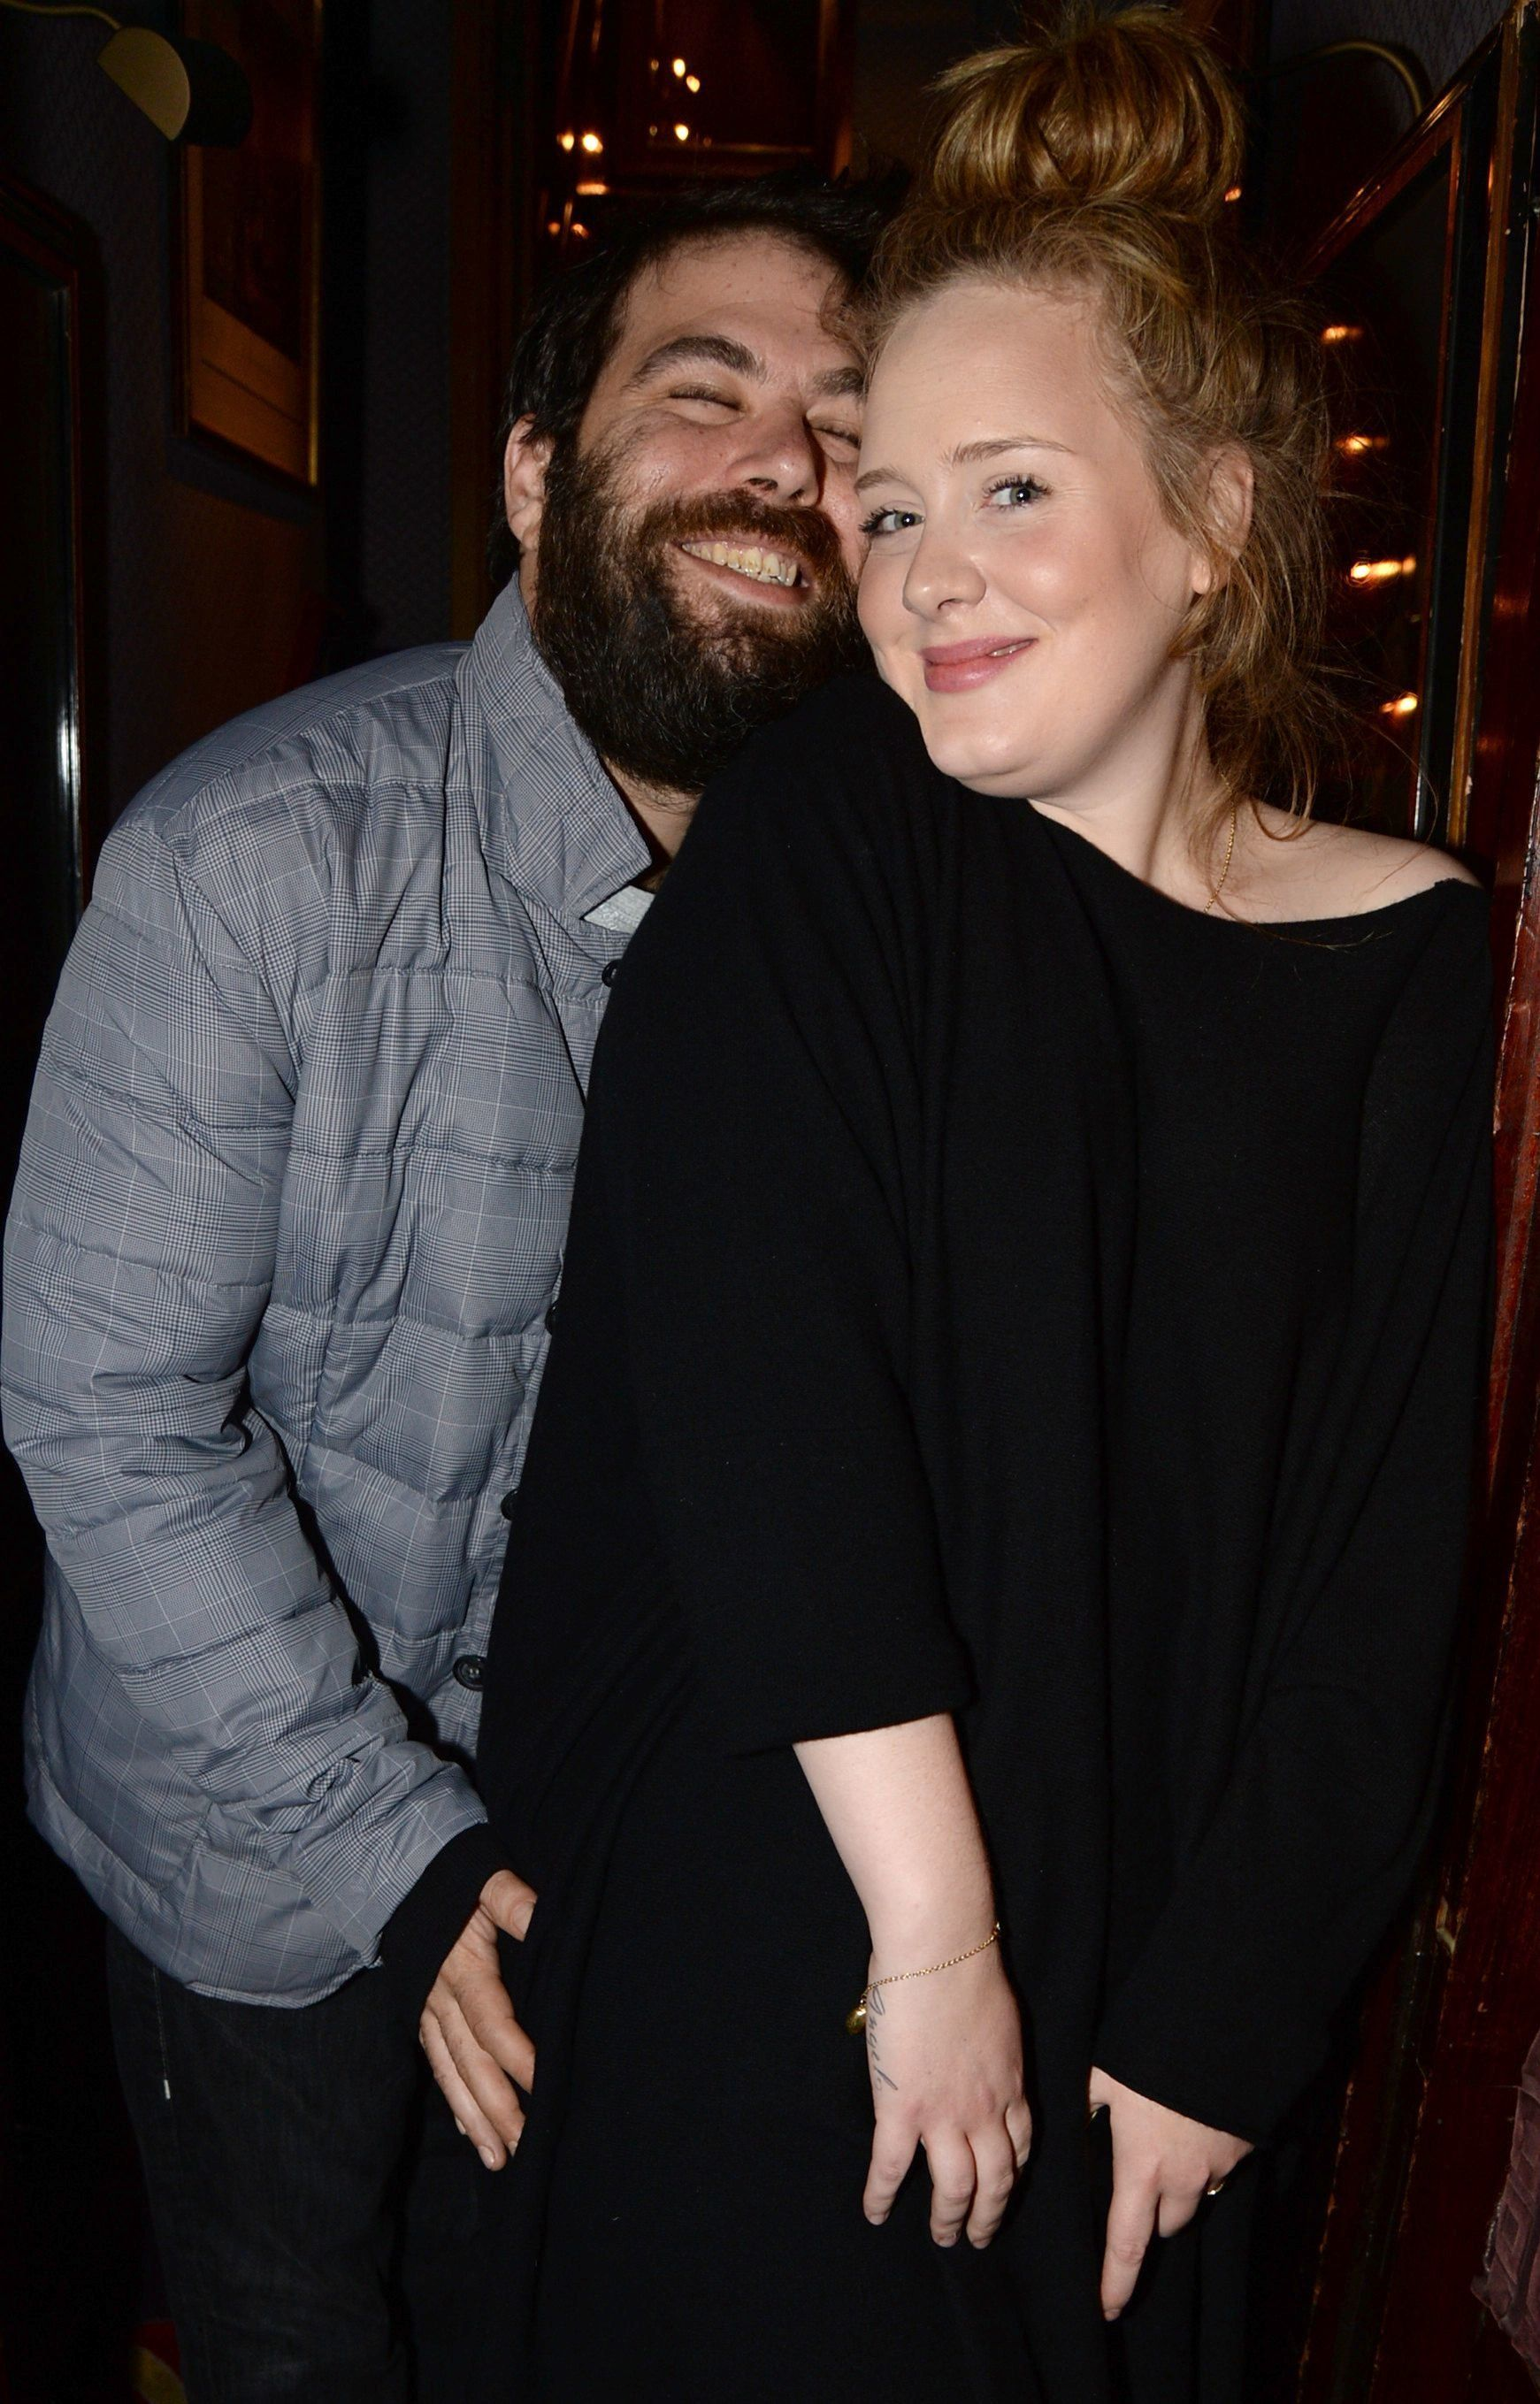 Adele and Simon Konecki at a Lady Gaga concert in